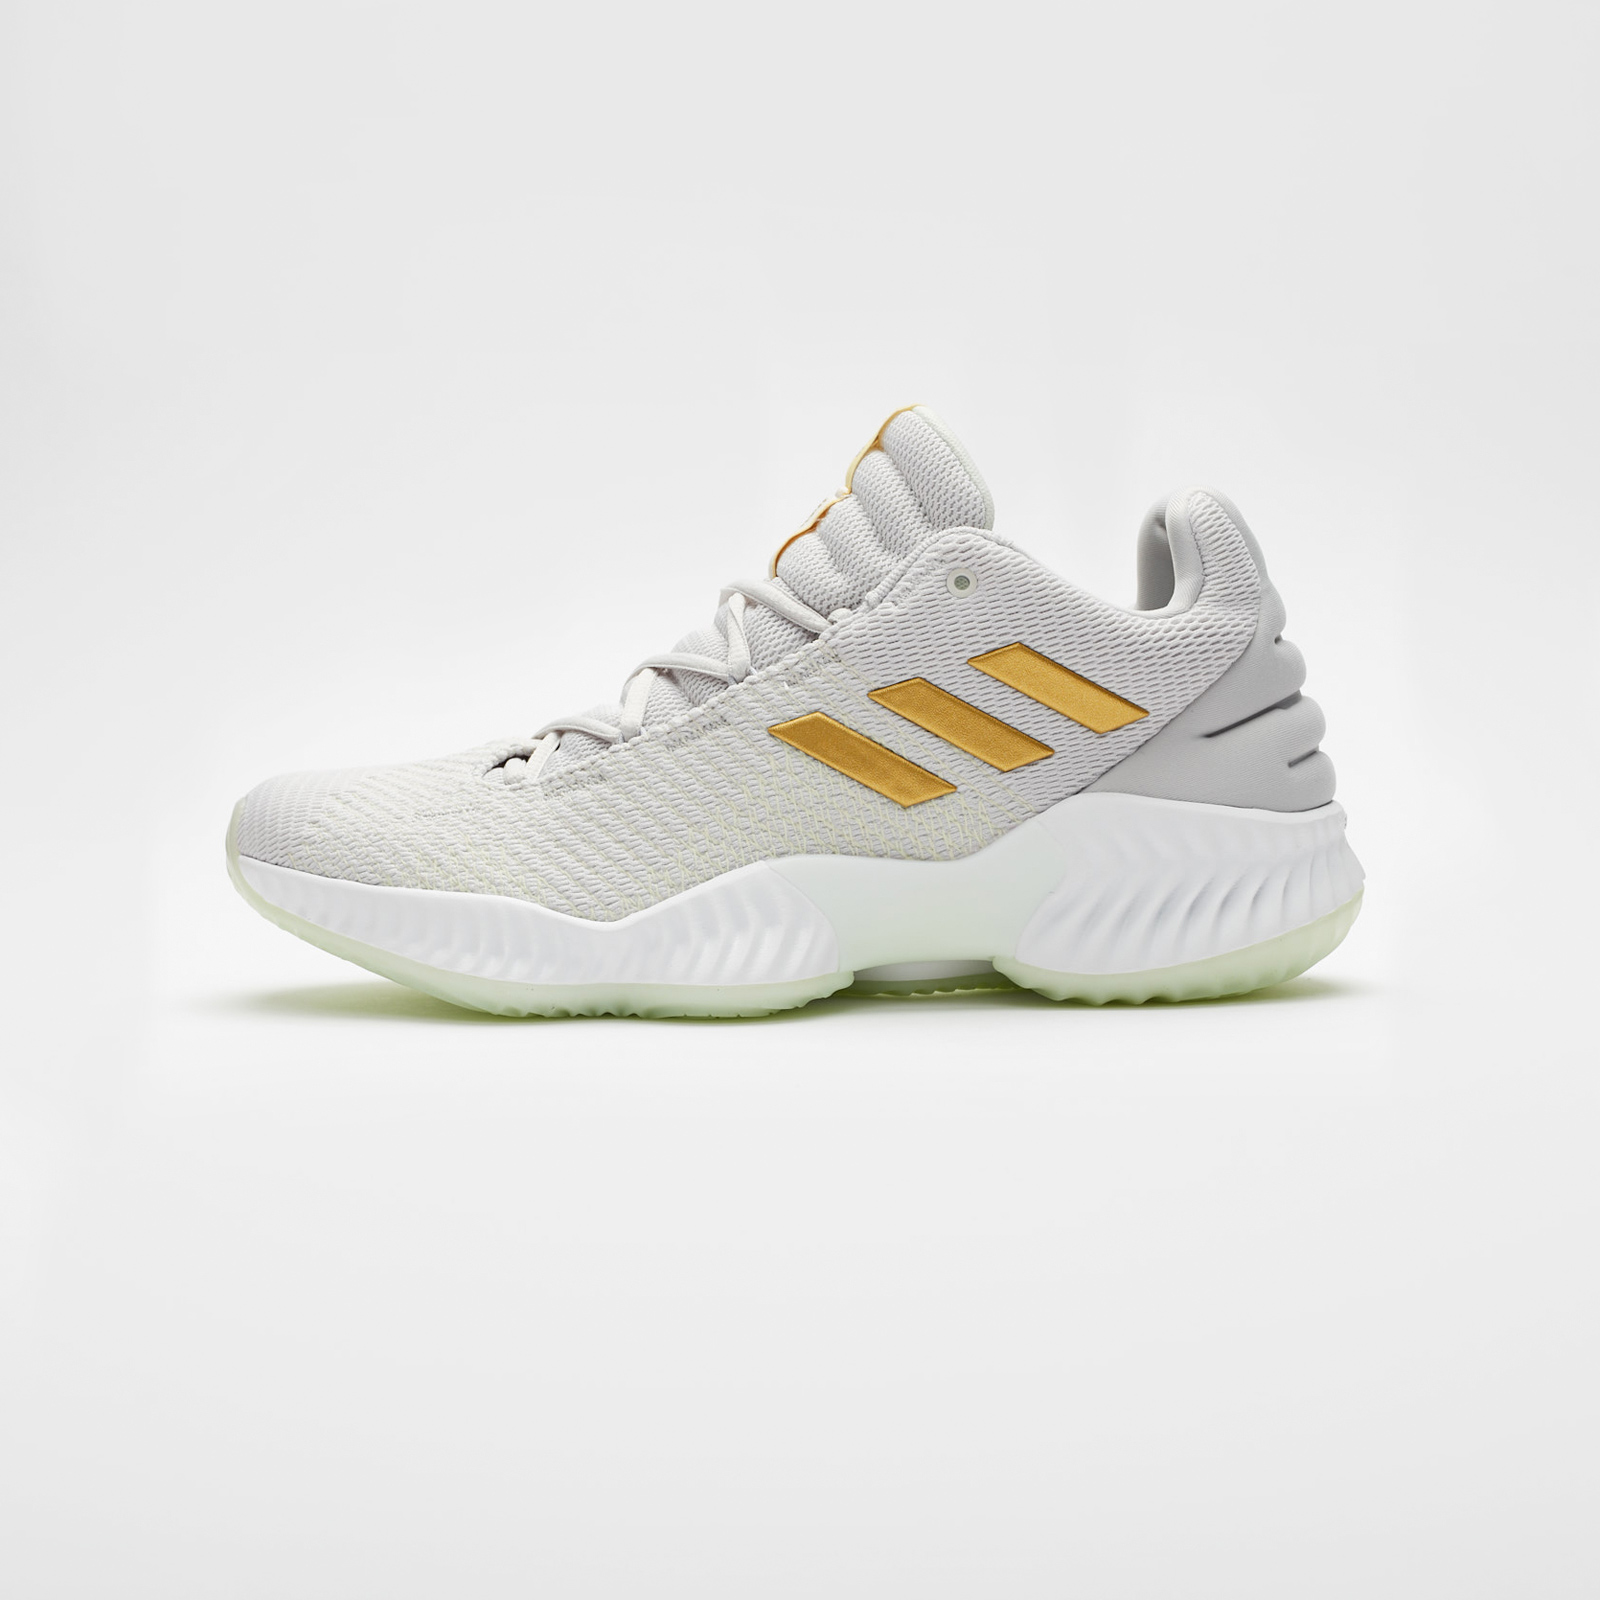 f37f196e7729 adidas Pro Bounce 2018 Low - B41863 - Sneakersnstuff